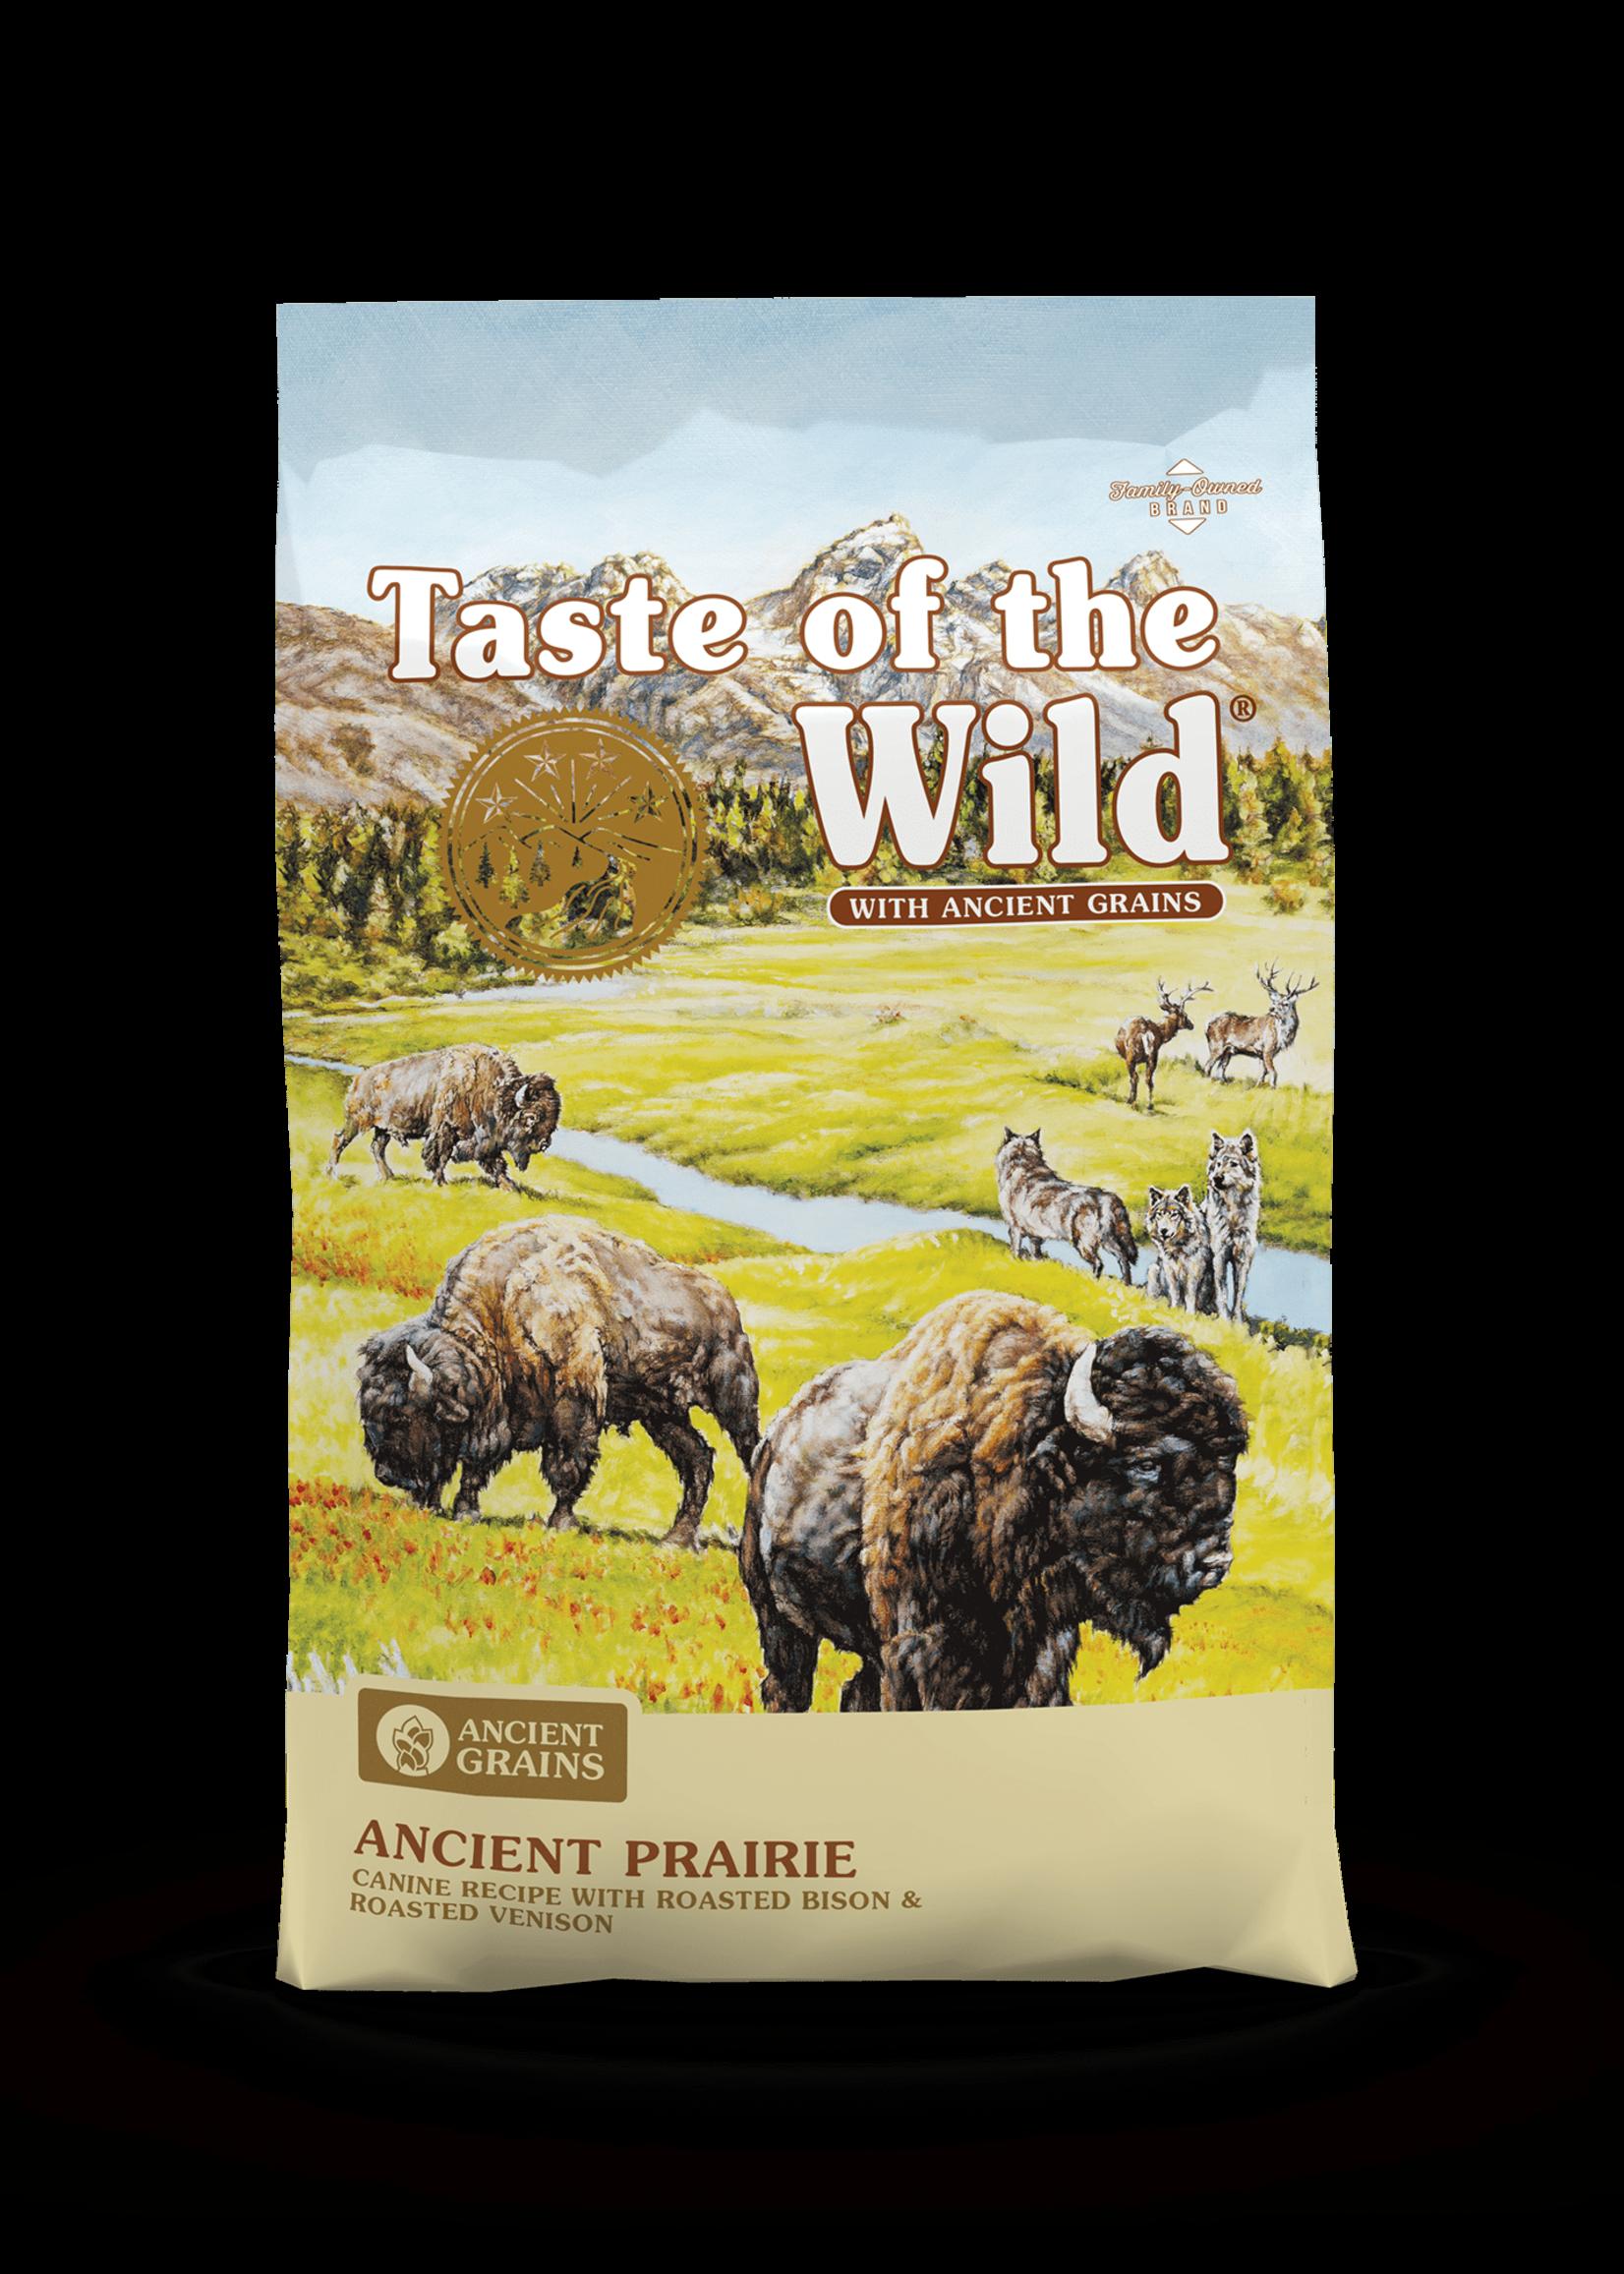 Taste of the Wild Taste of the Wild Ancient Prairie 28lbs